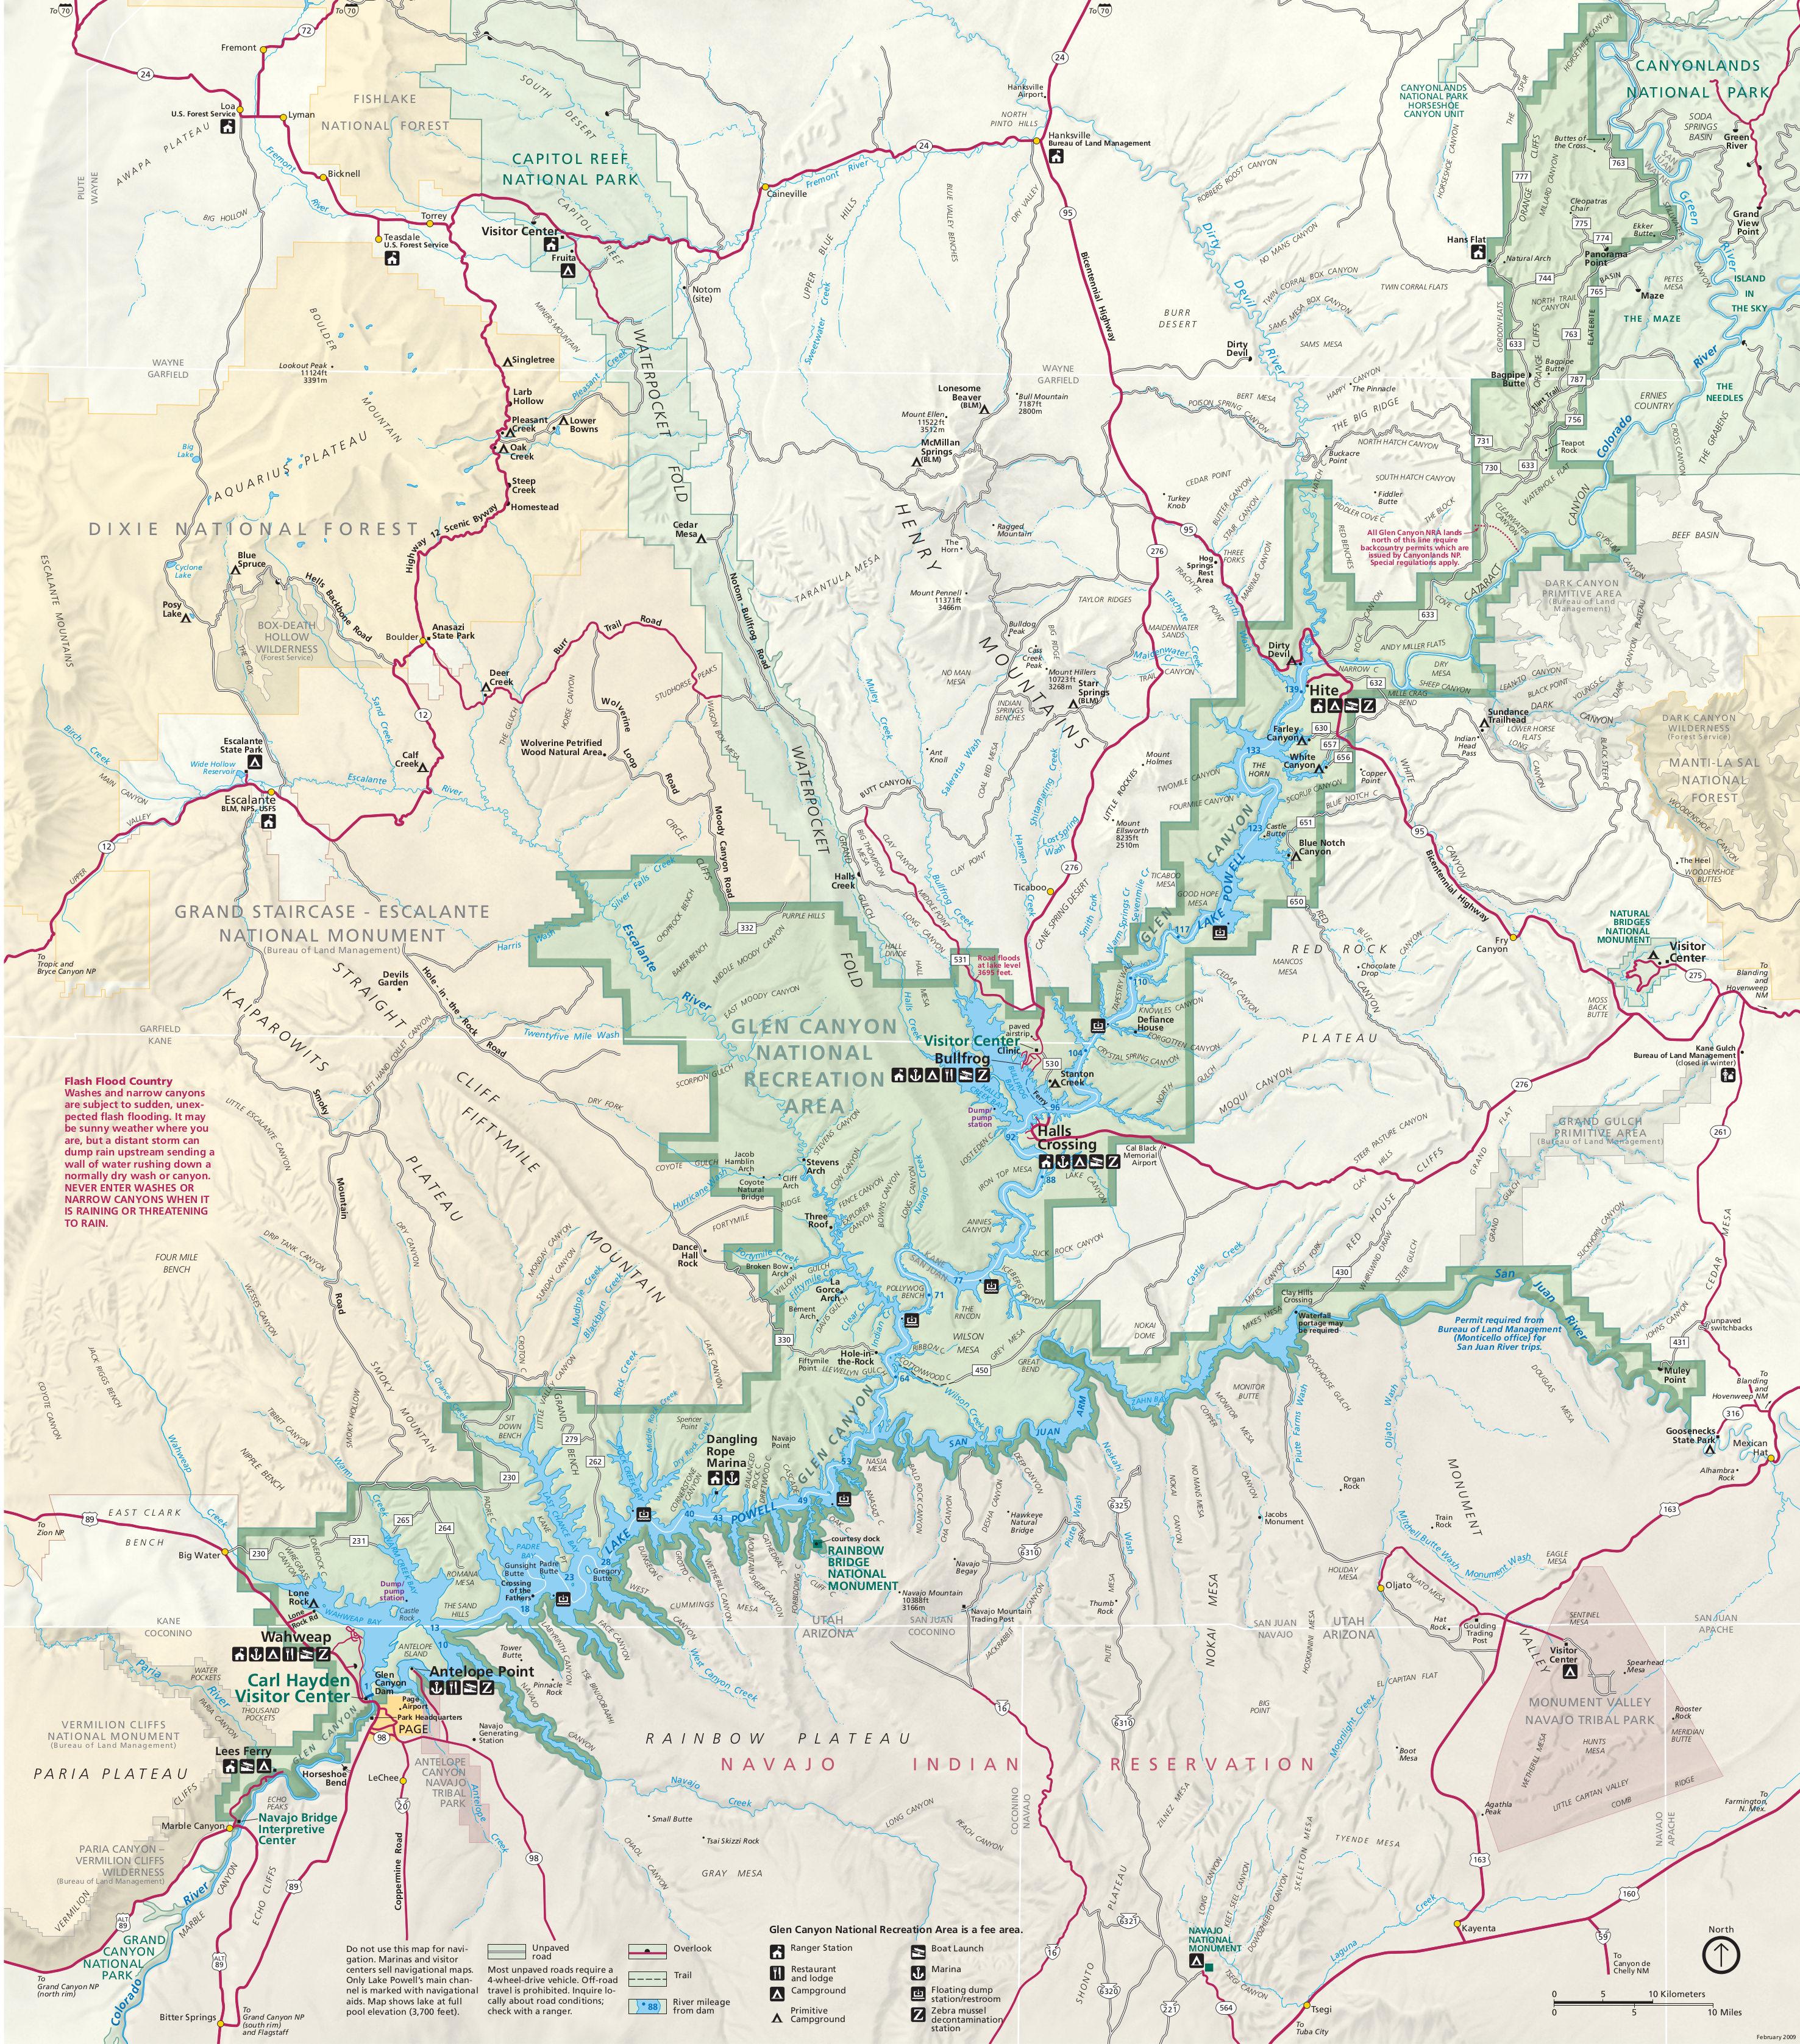 Lake Powell Map Lake Powell Maps | NPMaps.  just free maps, period. Lake Powell Map